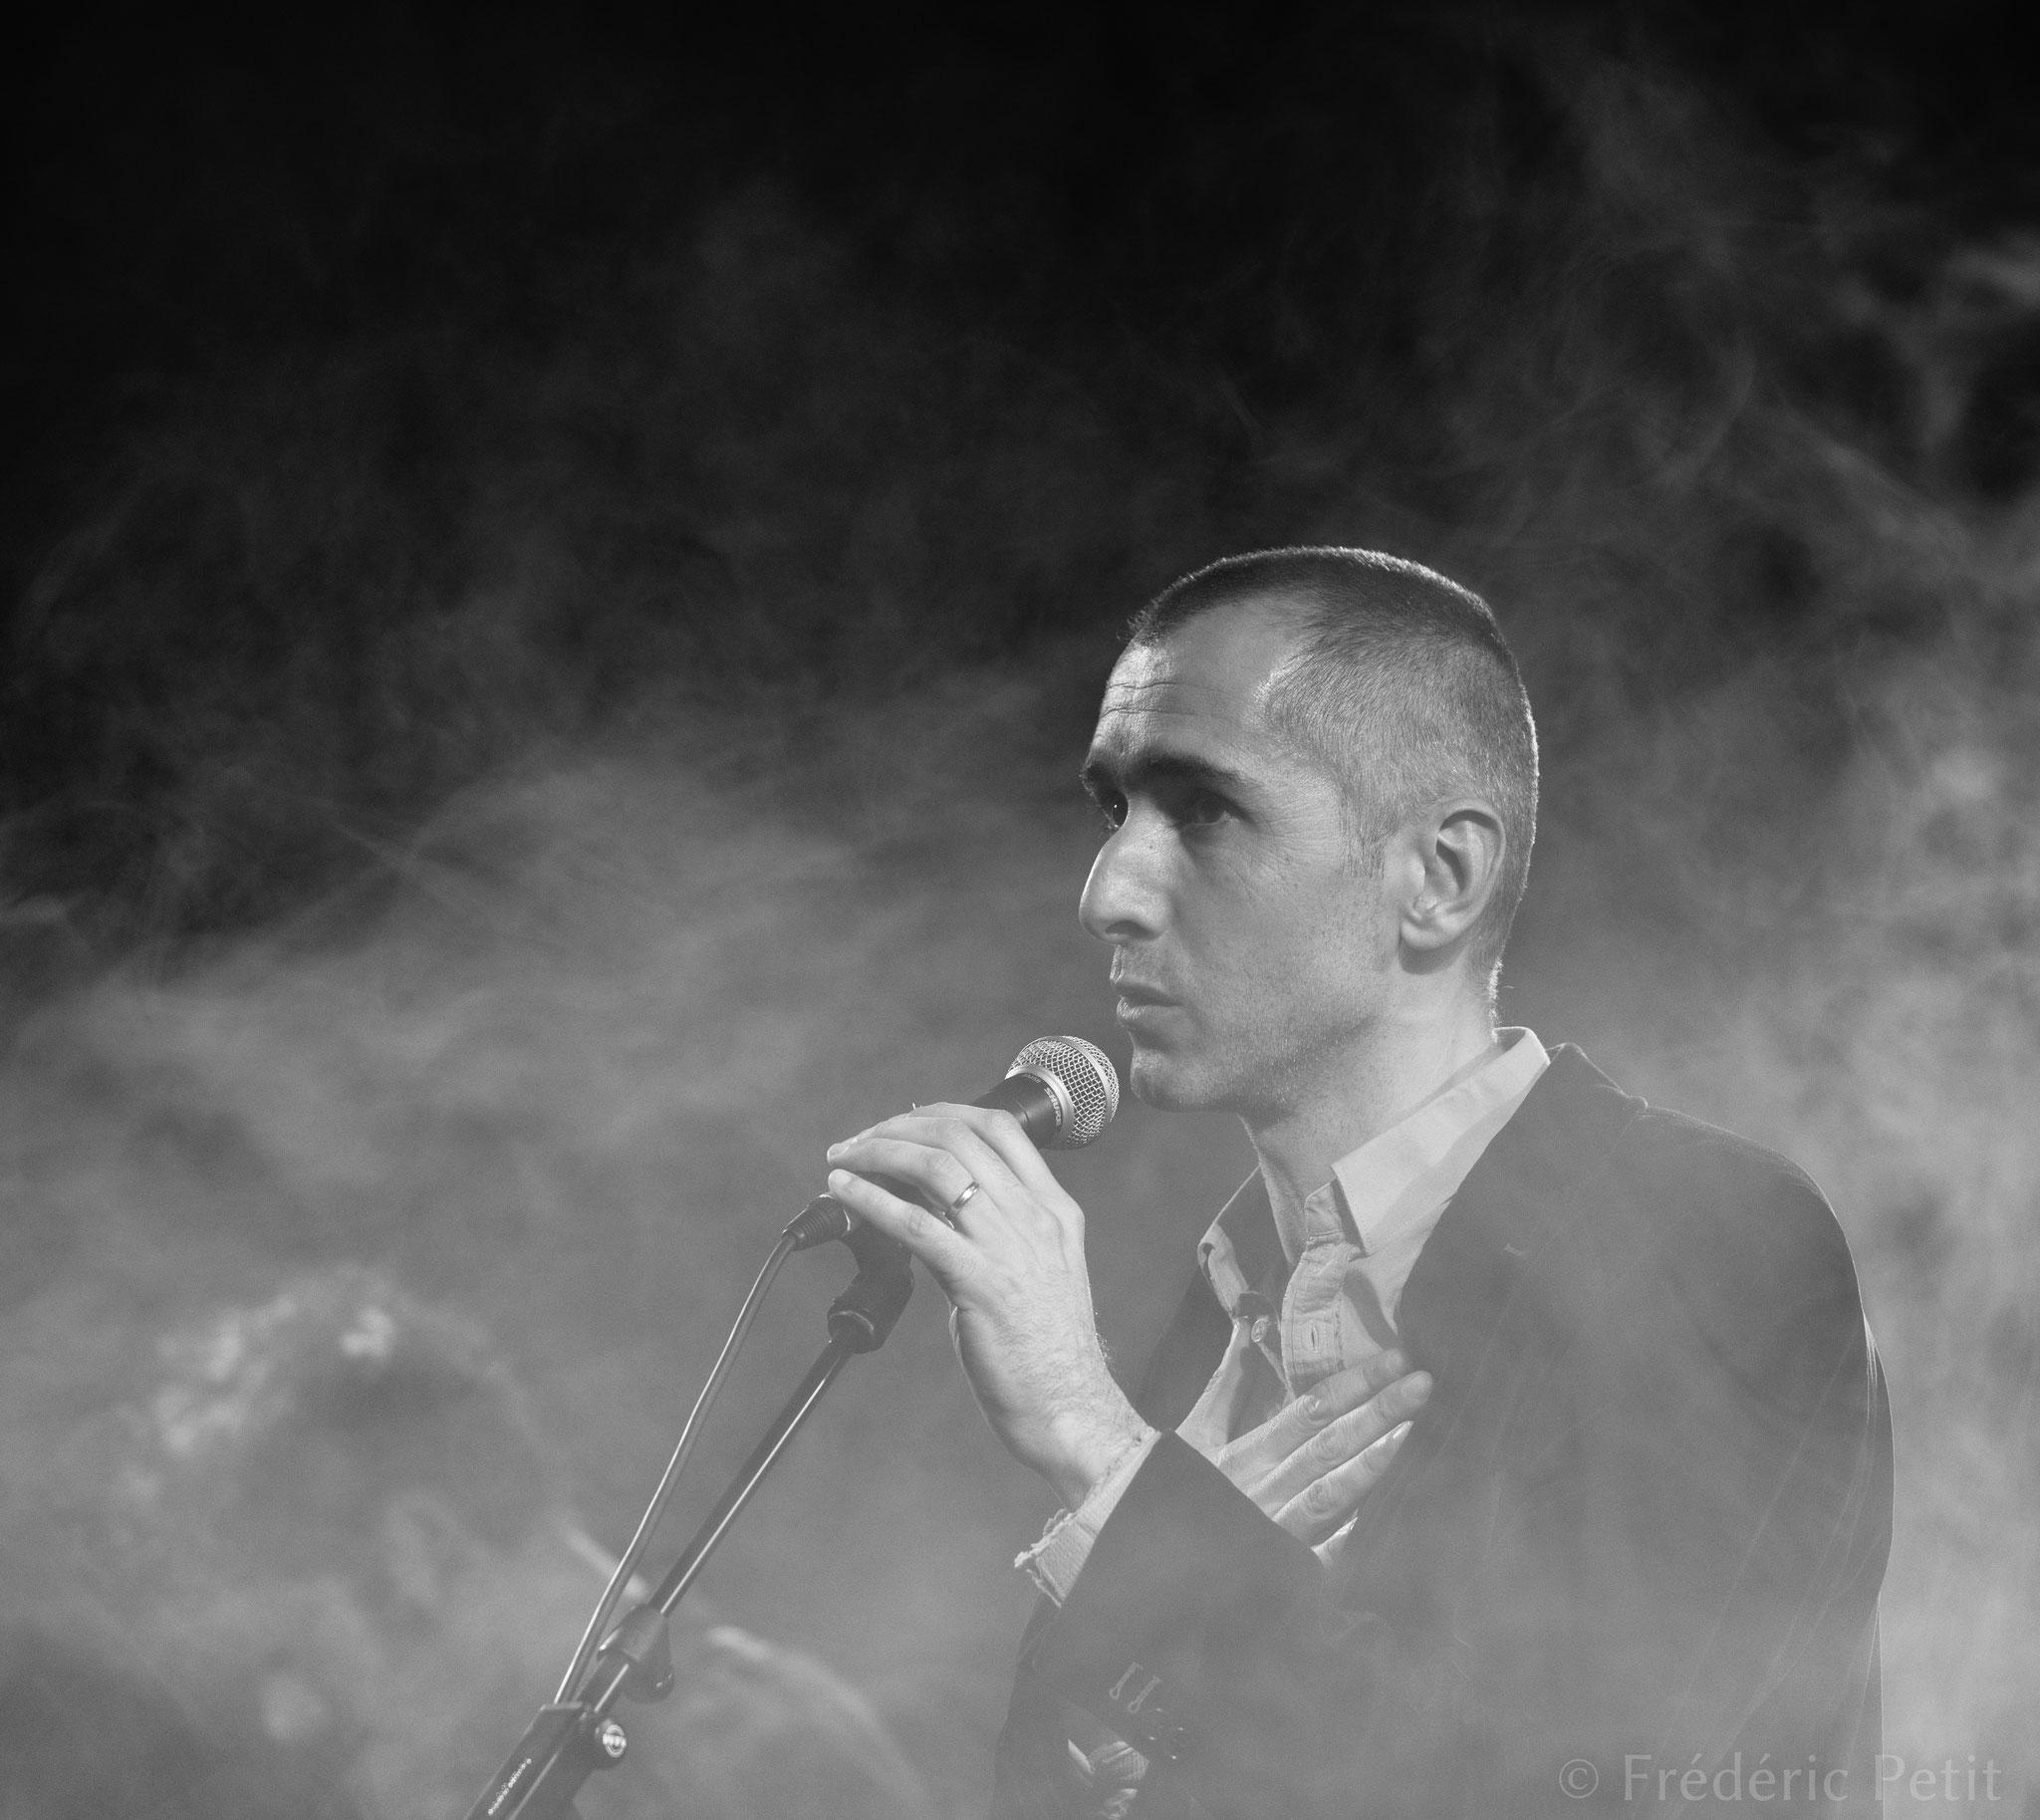 16 février 2017 - Bergame @ Centre Malesherbes (Prix Moustaki)